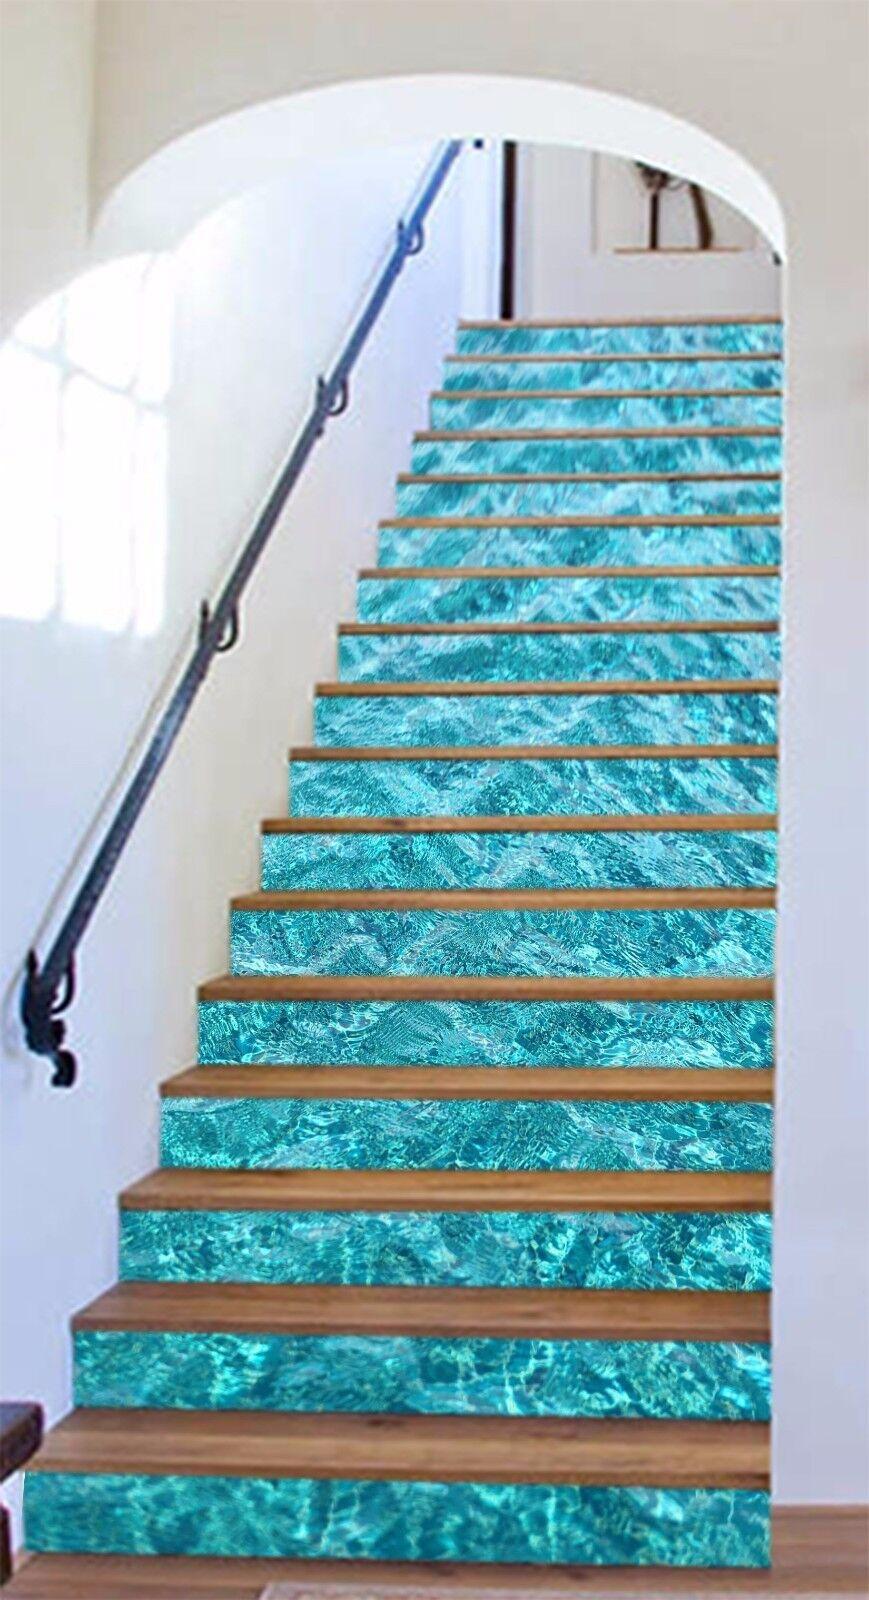 3D Shiny Sea Water Stair Risers Decoration Photo Mural Vinyl Decal WandPapier UK